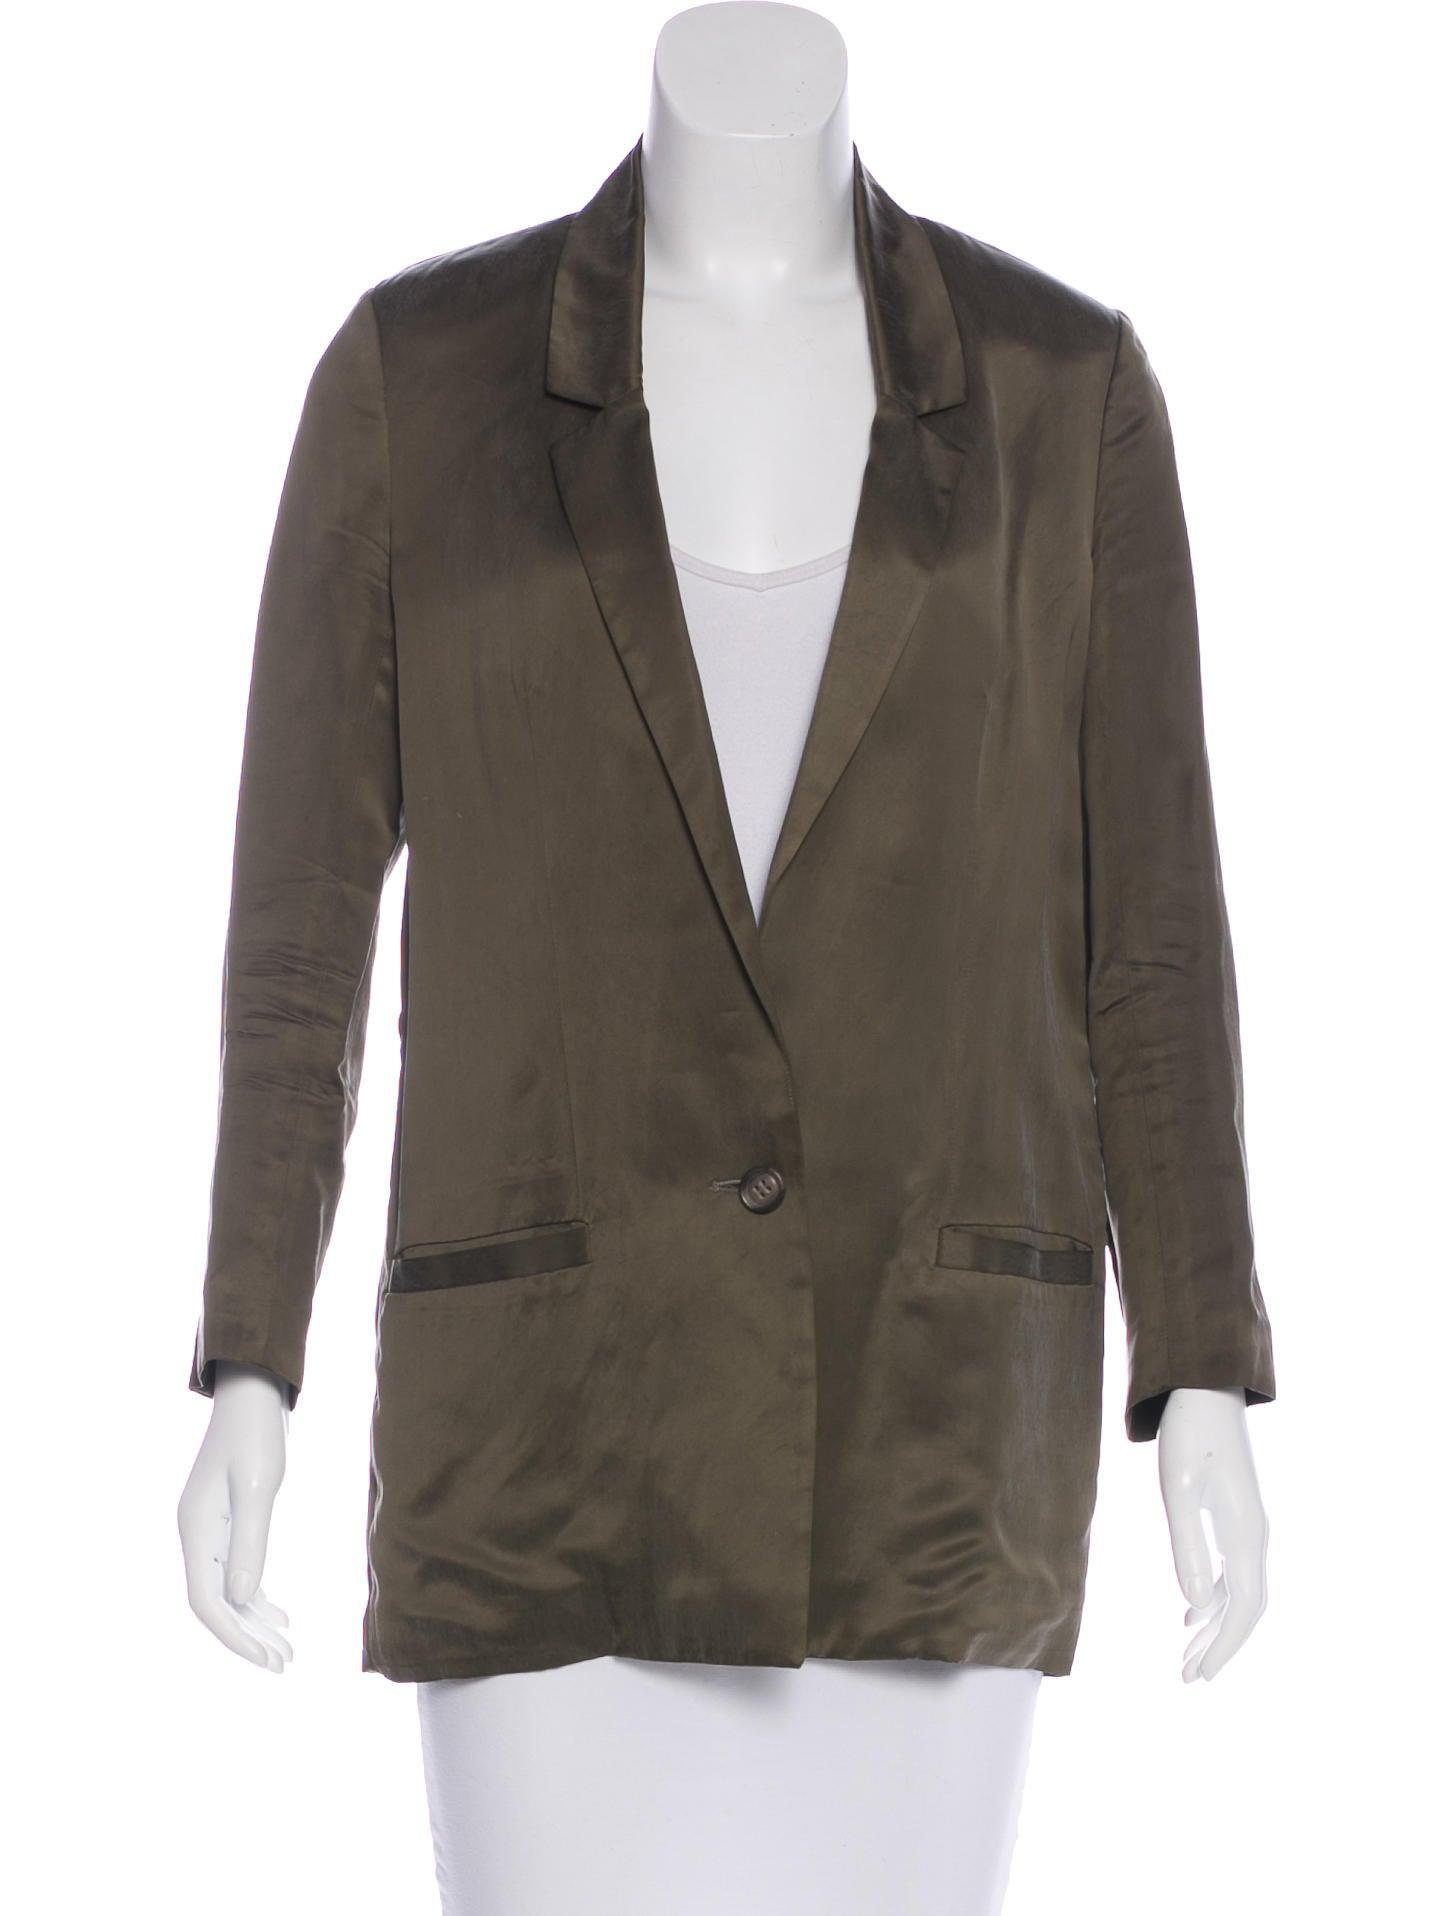 Sale Choice Diane von Furstenberg Shade Structured Blazer Collections Buy Cheap For Cheap WbuMOG4b